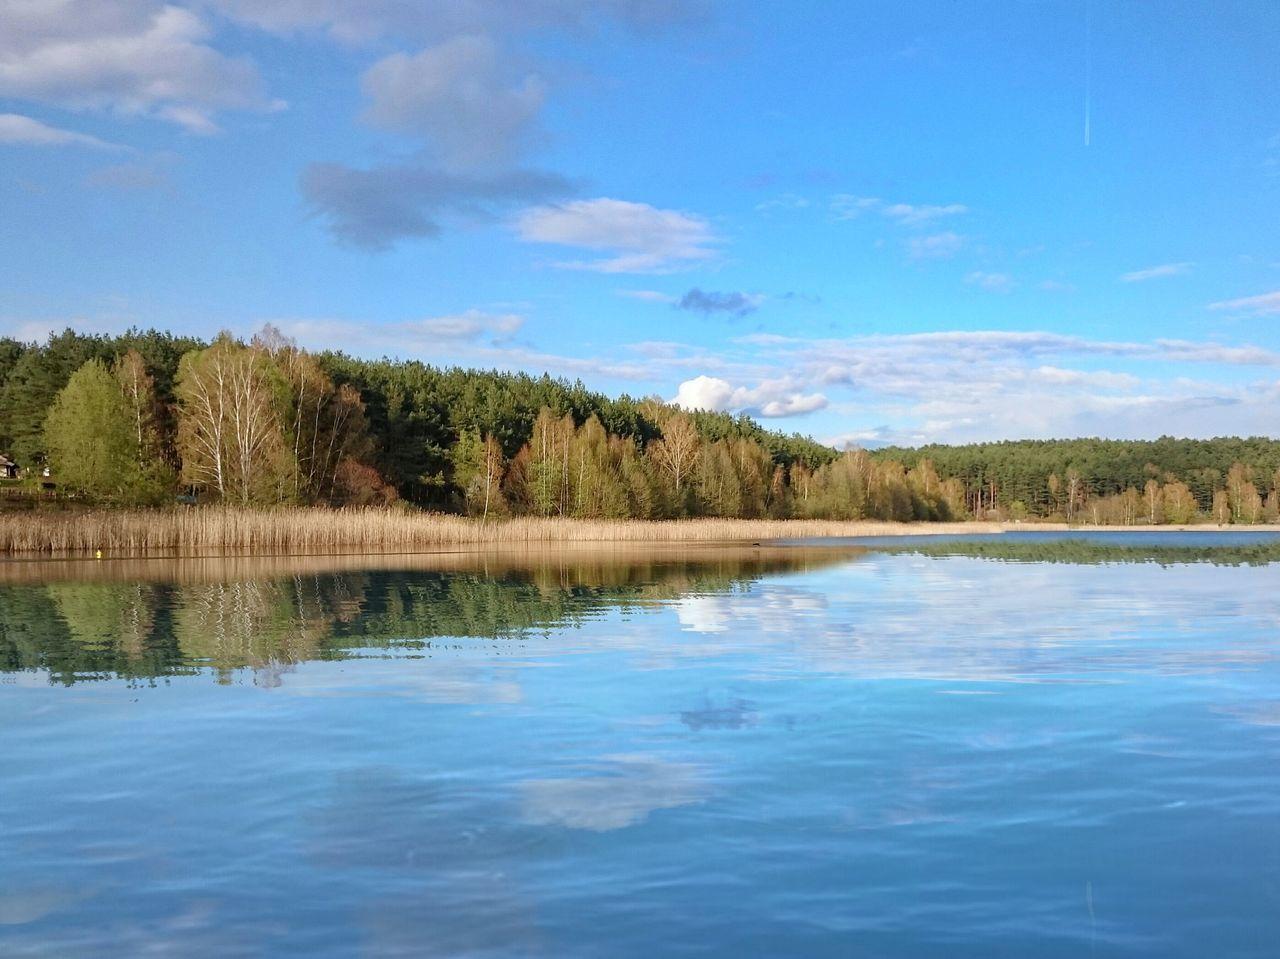 Reflection Water Nature Tree Cloud - Sky Lake Outdoors No People Day Scenics Blue Sky Poland Warmia Mazury